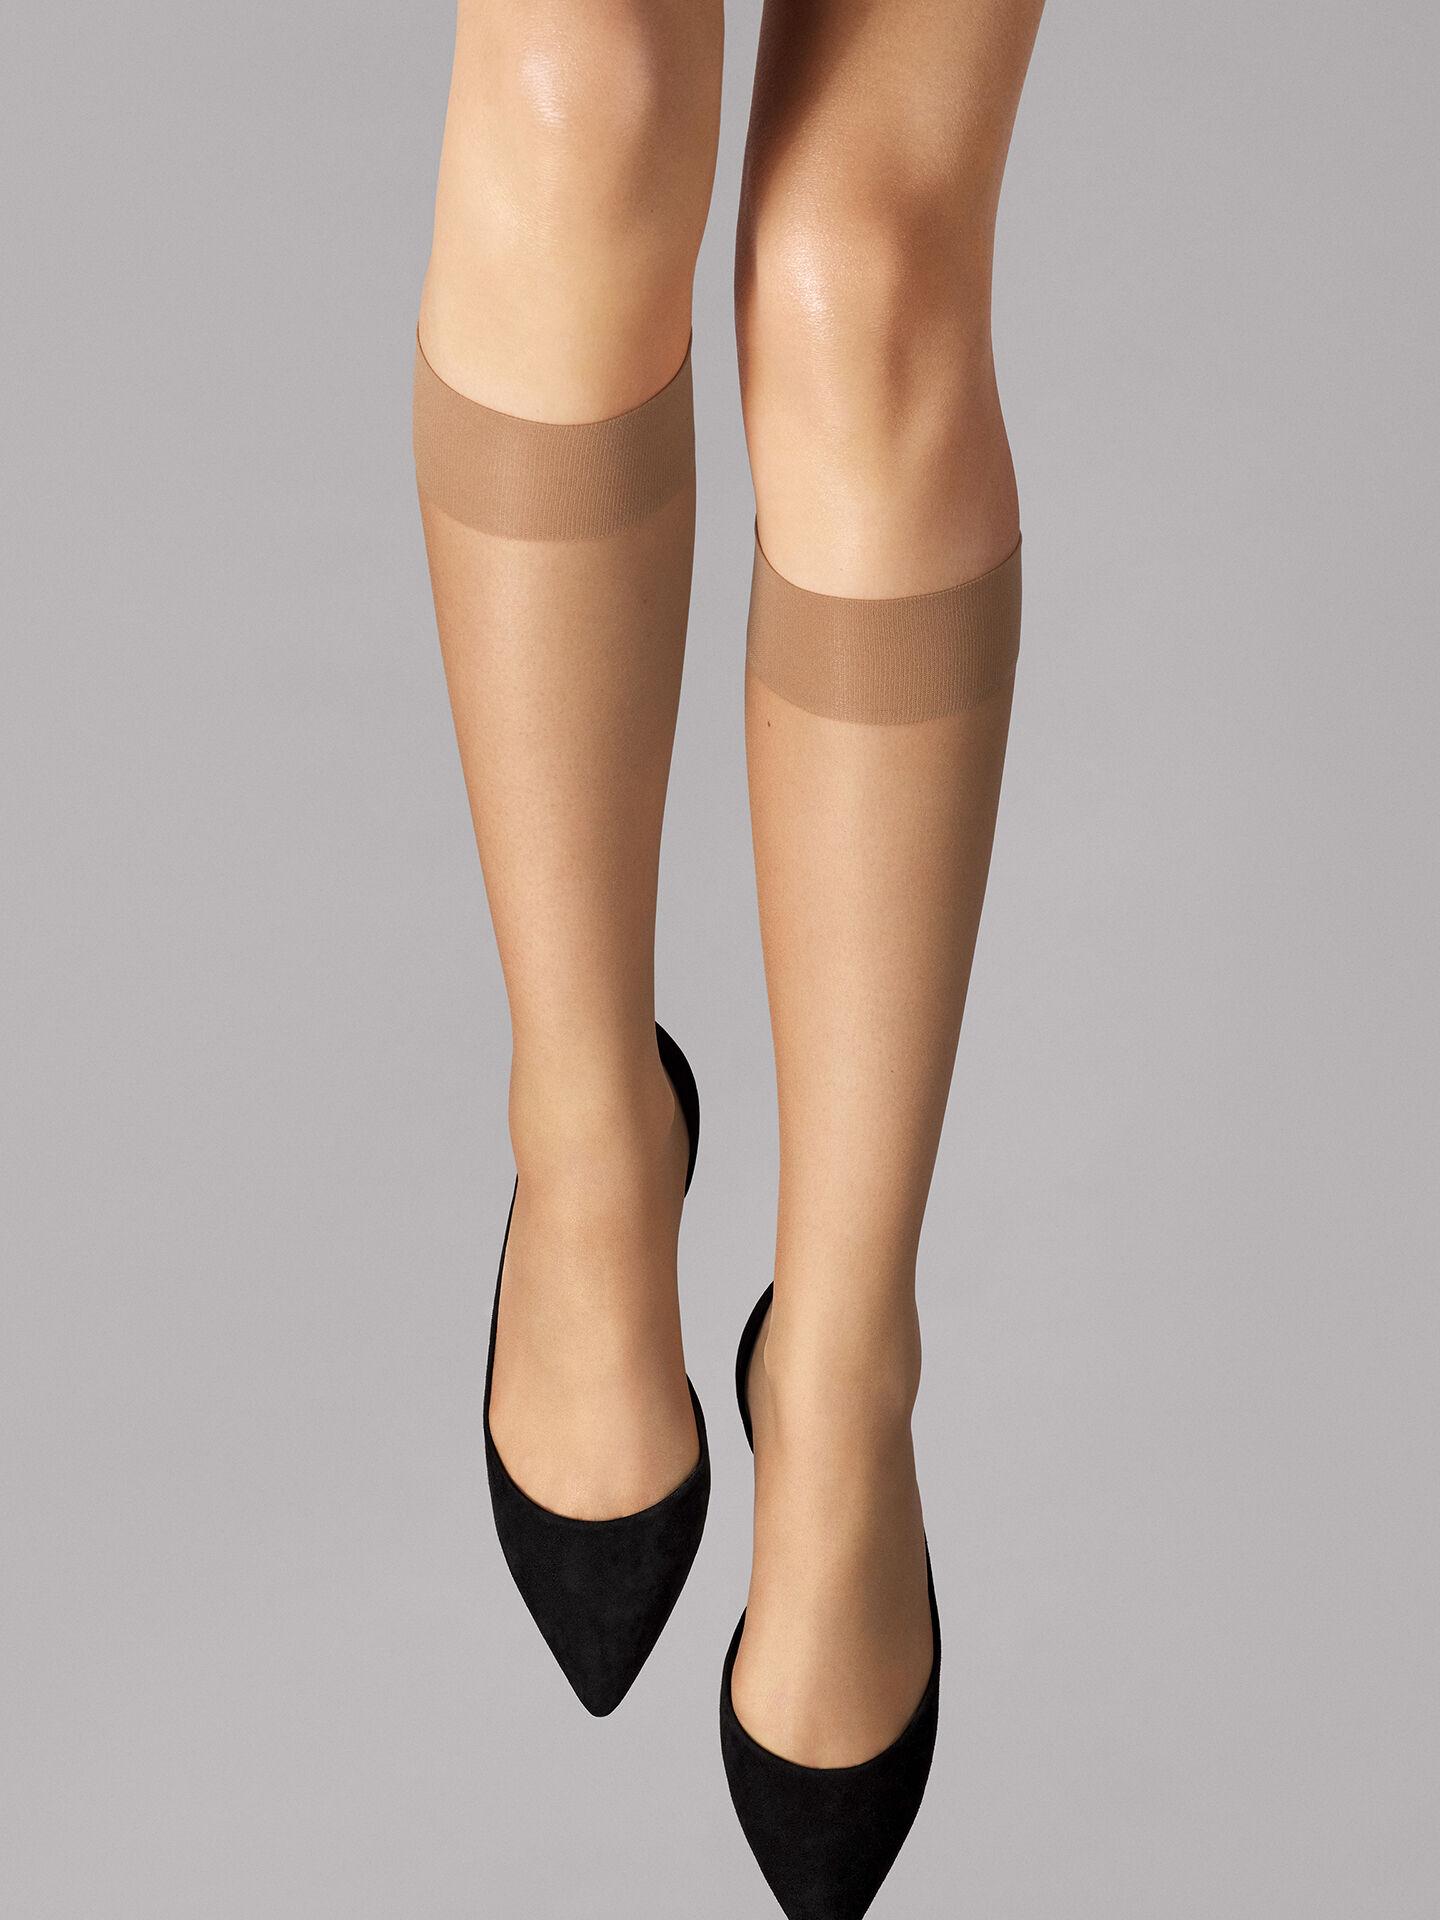 Wolford Sheer 15 knee-highs 15 i calzettoni trasparenti